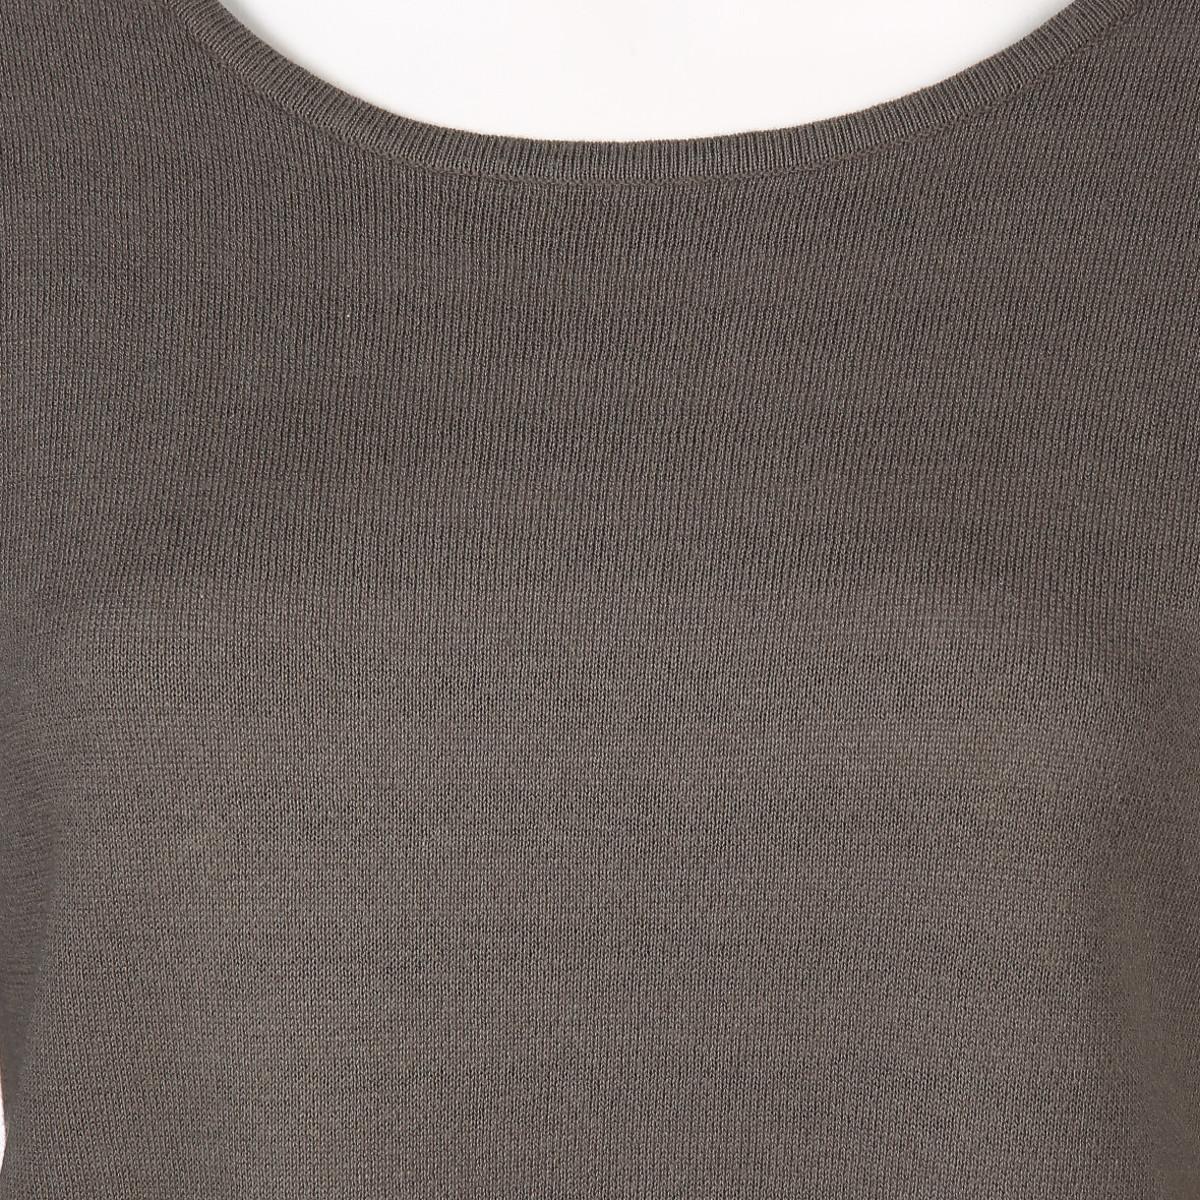 Bild 3 von Damen Pullover  in Doubleface Optik